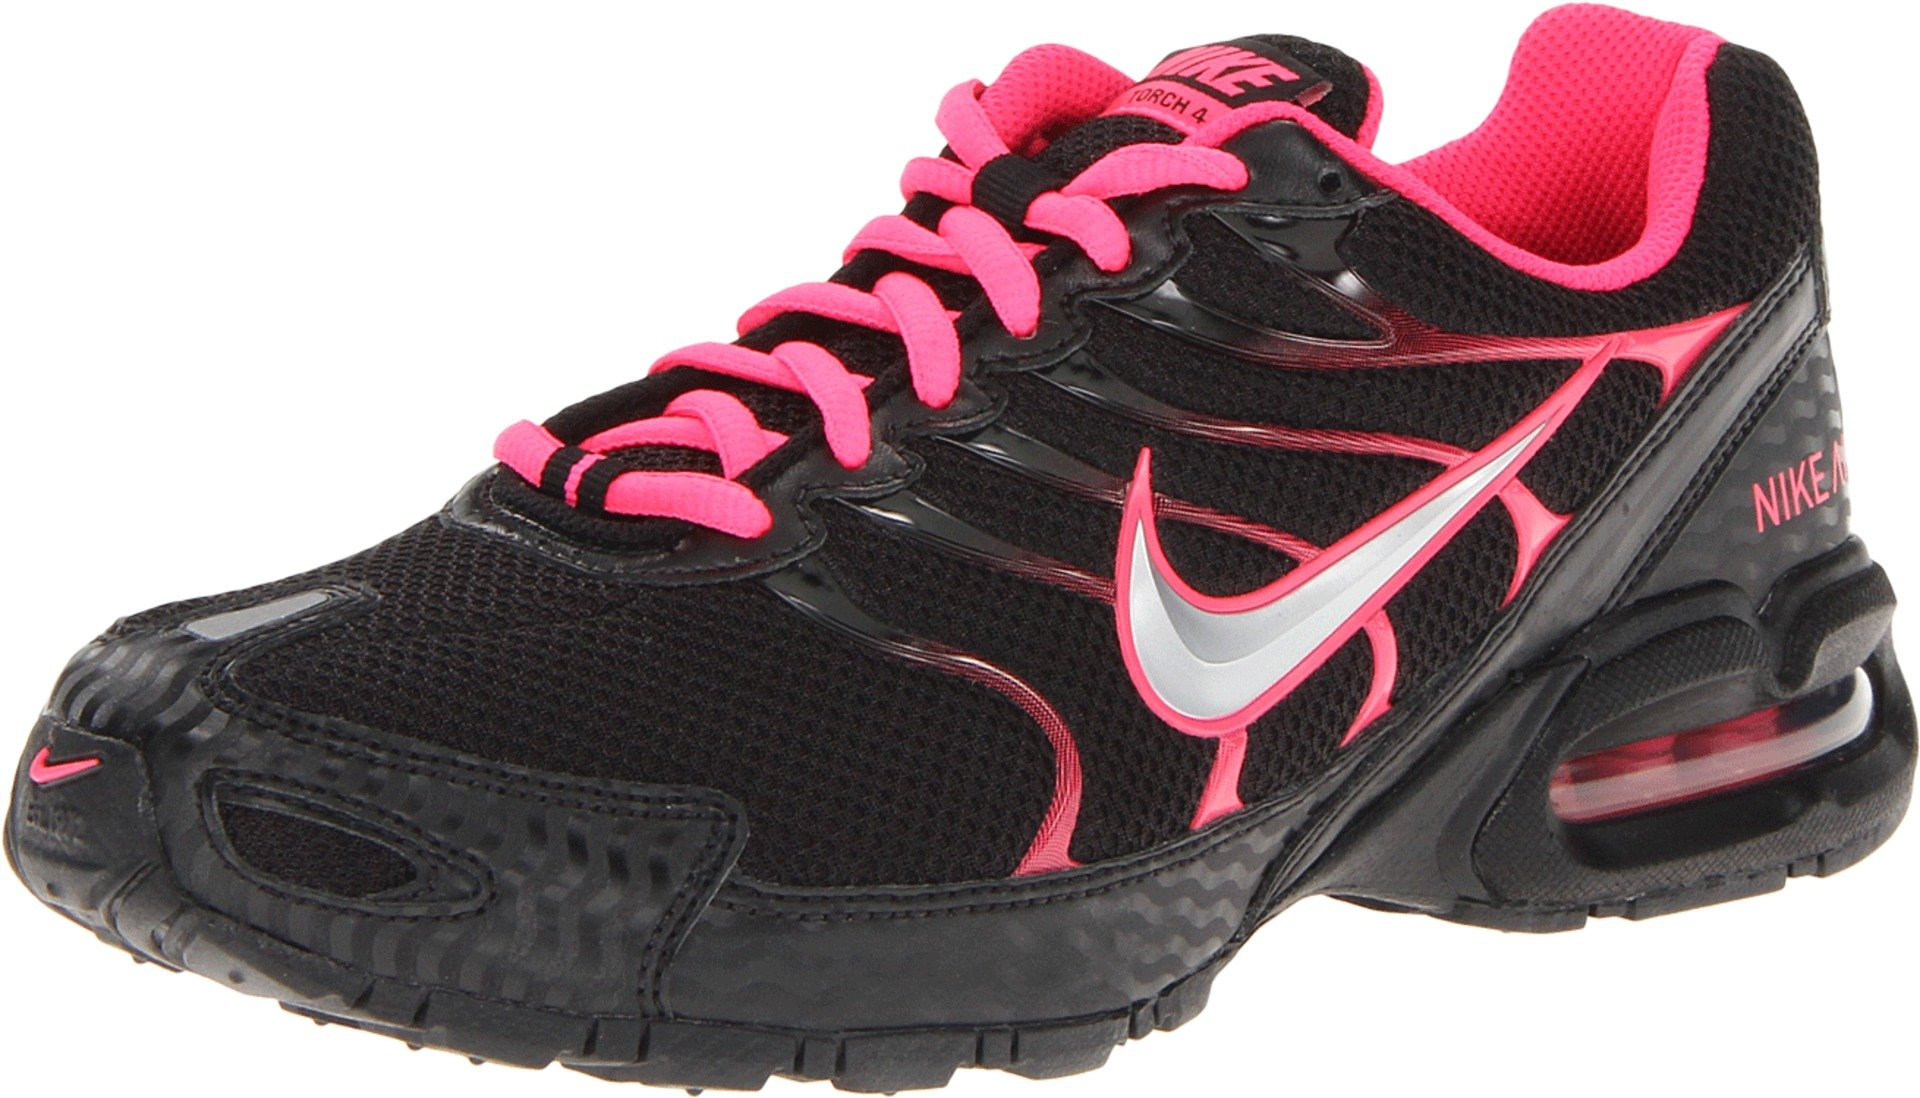 860c4dc0fb2 Galleon - Nike Women s Air Max Torch 4 Running Shoes (7.5 B(M) US ...